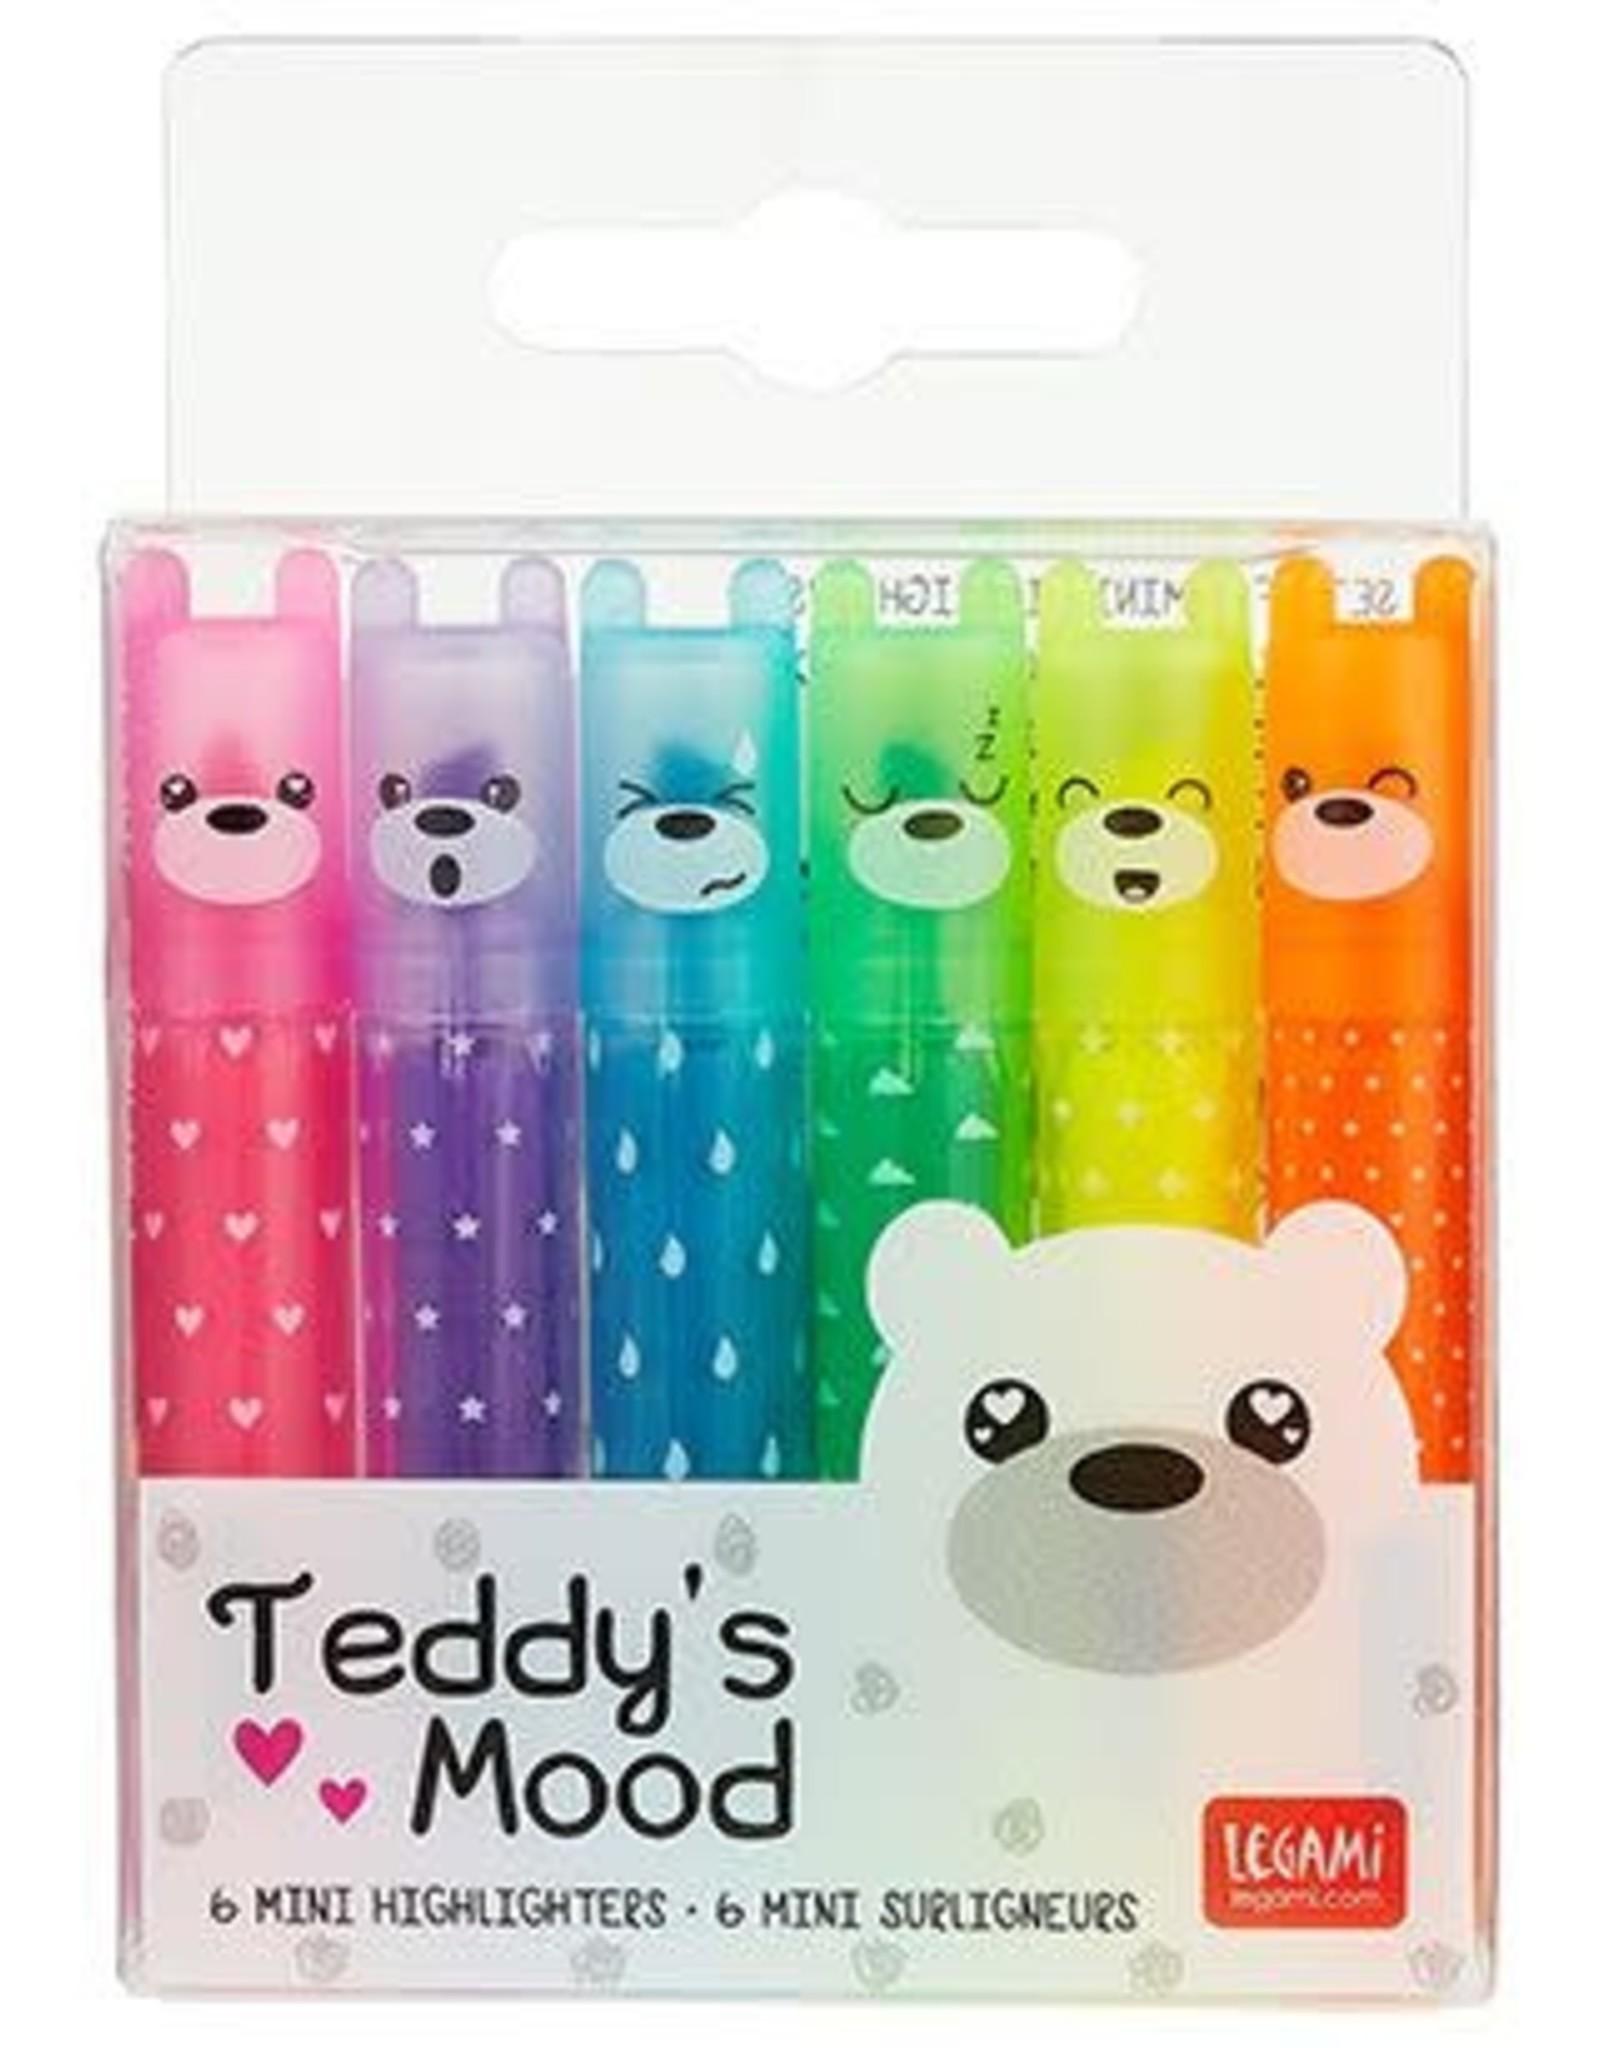 Legami highlighters - Teddy's mood (6pcs)